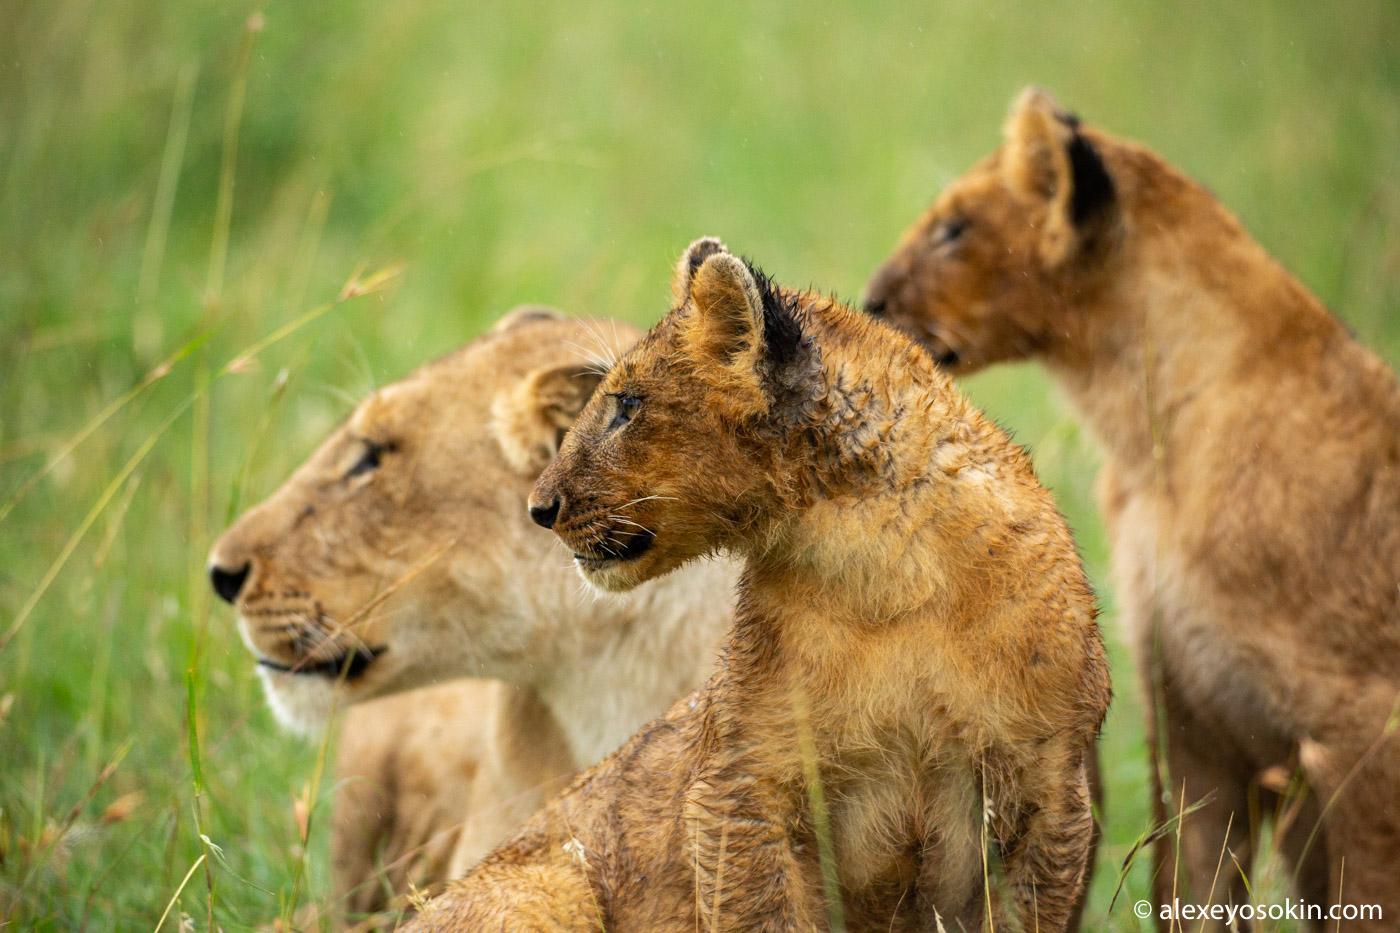 Львиные истории Масаи-Мара. Мило и жестоко.